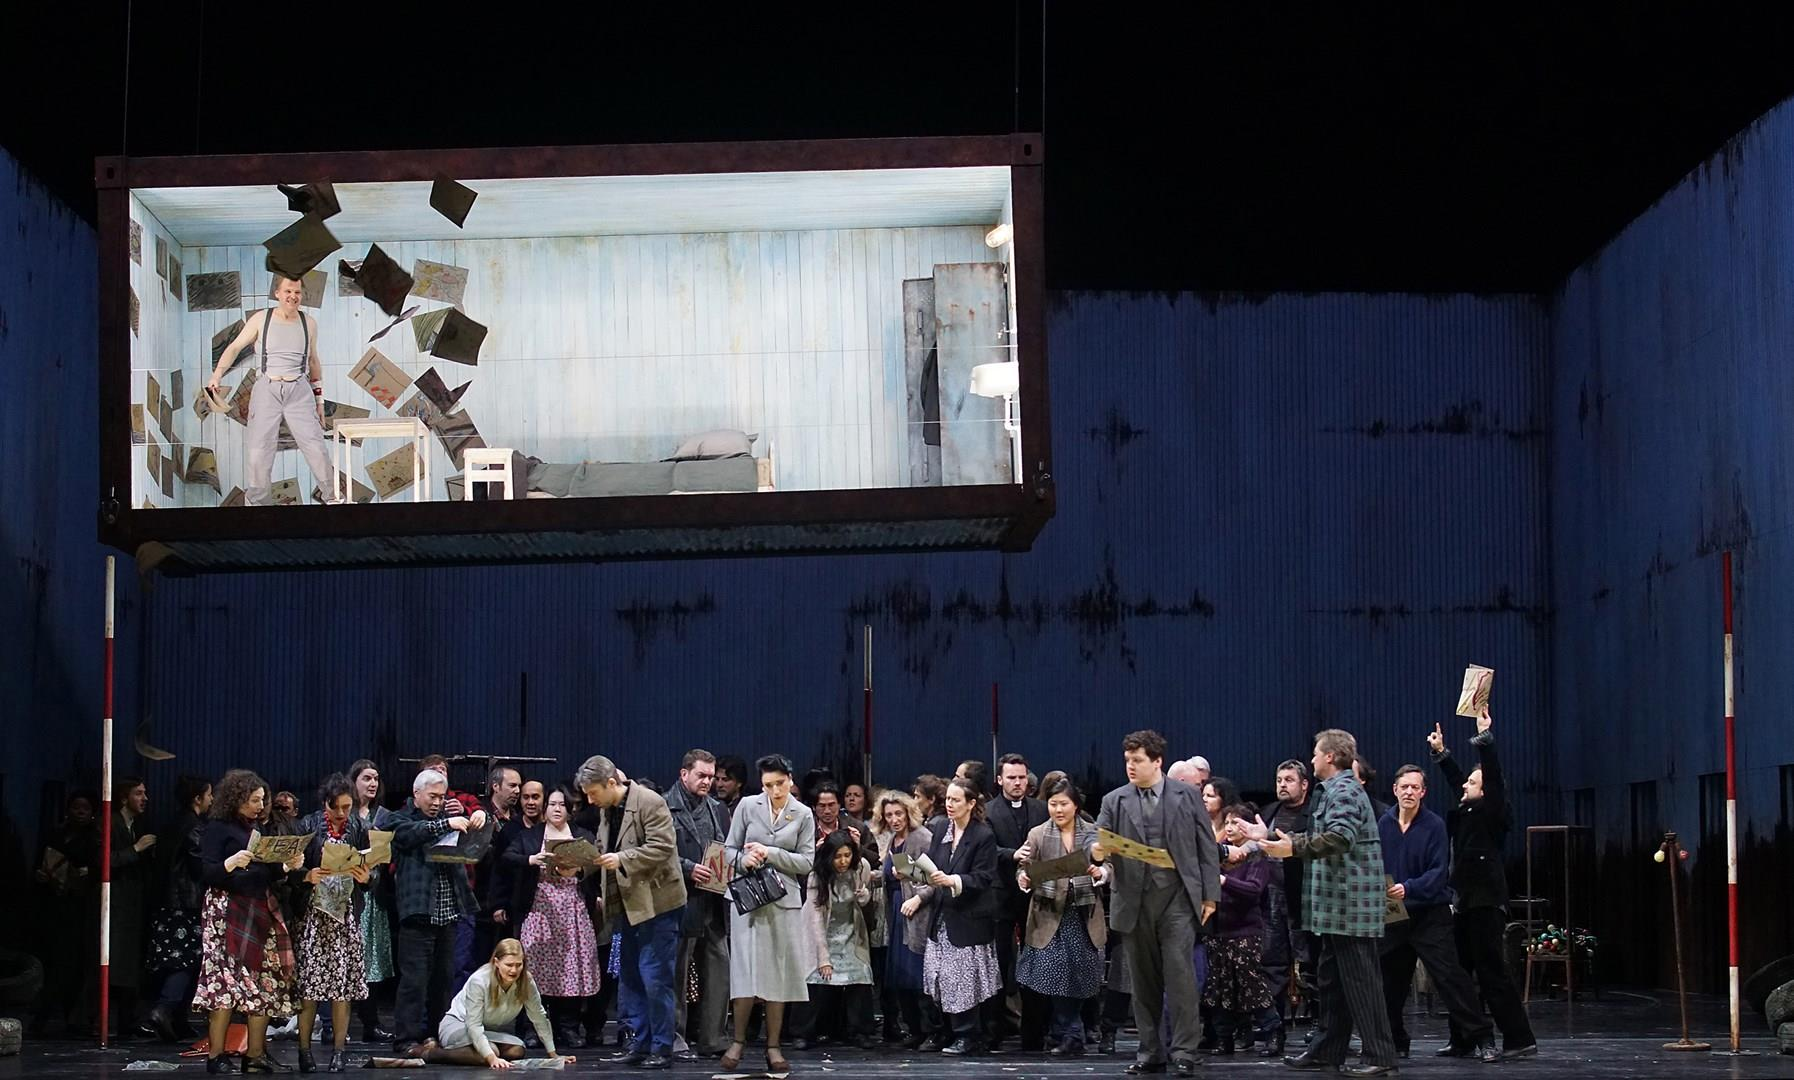 Peter Grimes - Wiederaufnahme - Benjamin Britten - Feb 27 bis Juni 17